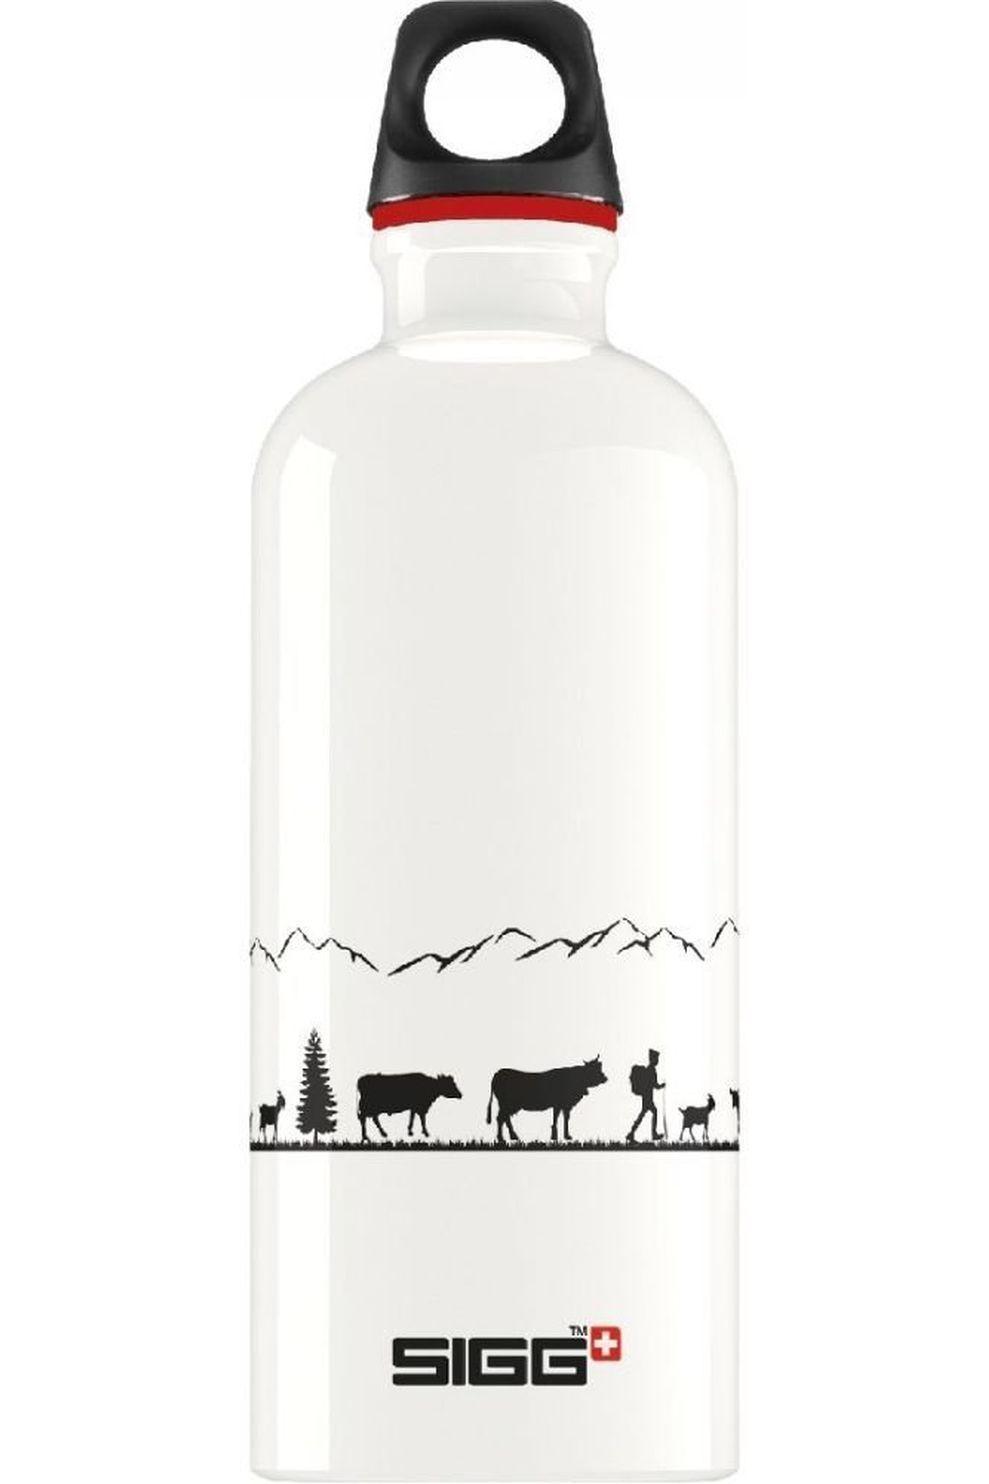 Sigg Drinkfles Swiss Craft 0.6L - Wit/Zwart